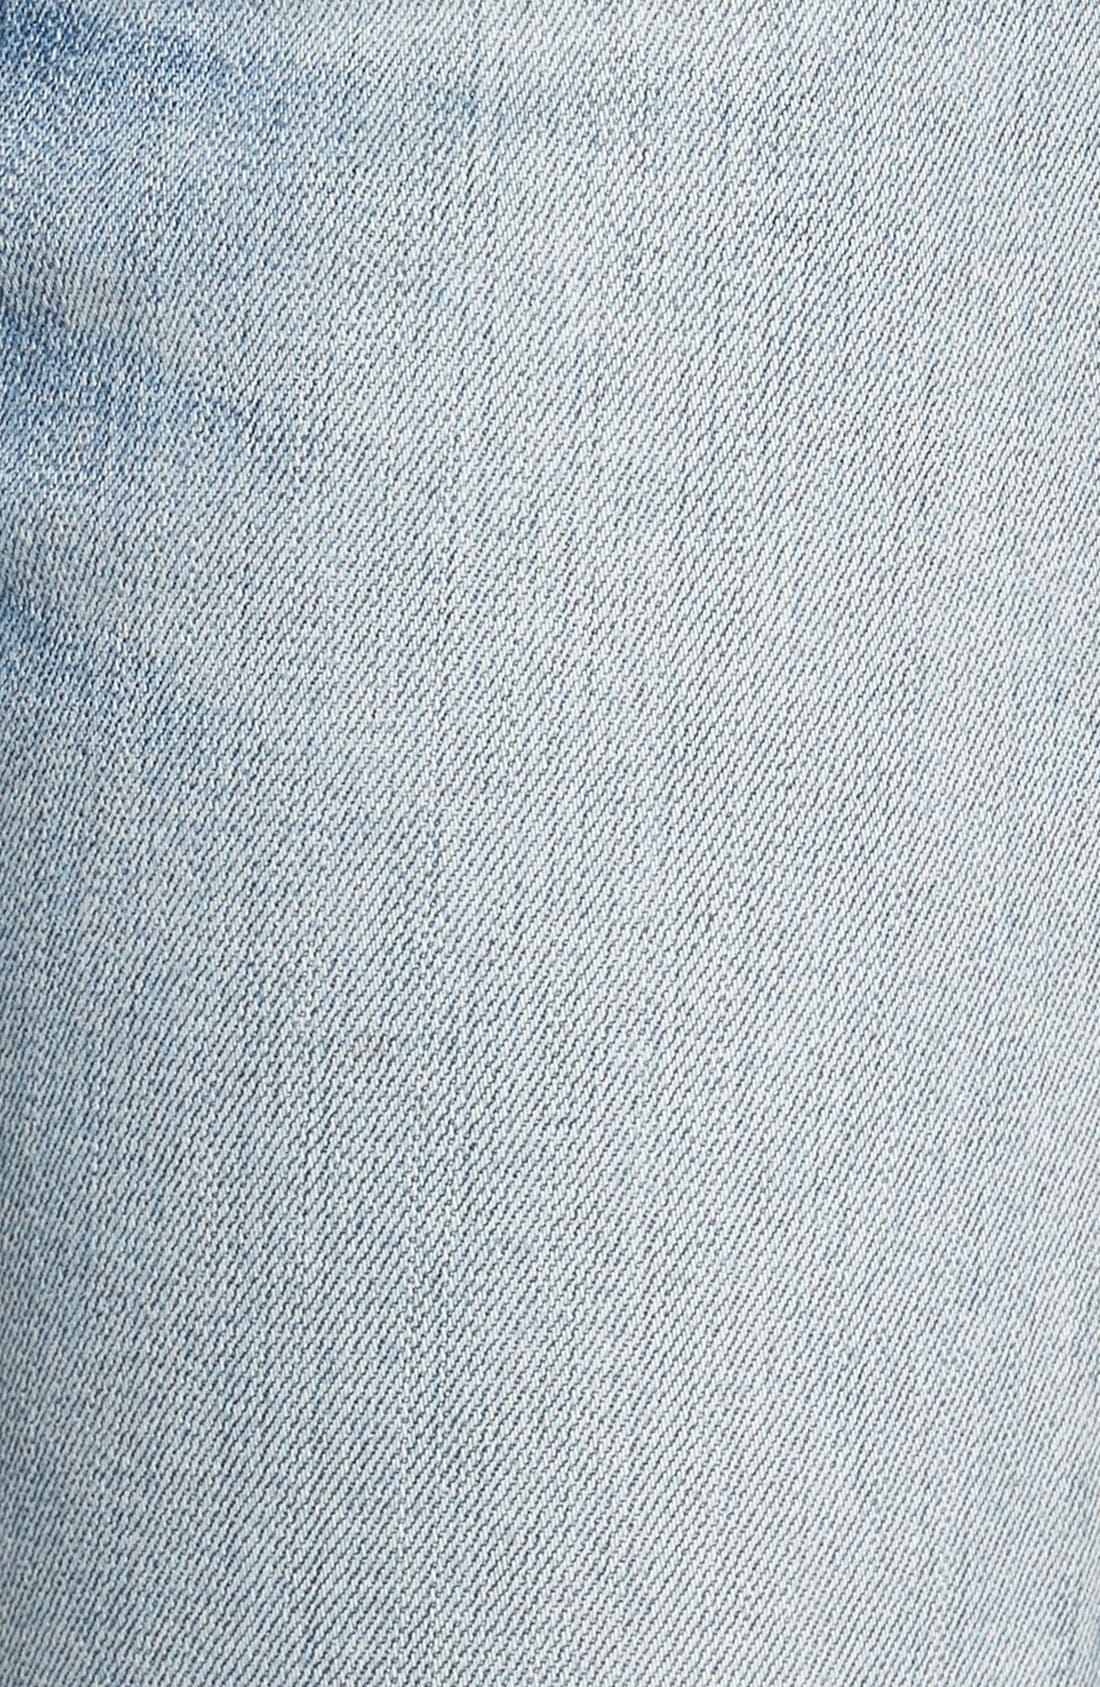 Alternate Image 5  - rag & bone/JEAN 'The Dre' Slim Boyfriend Jeans